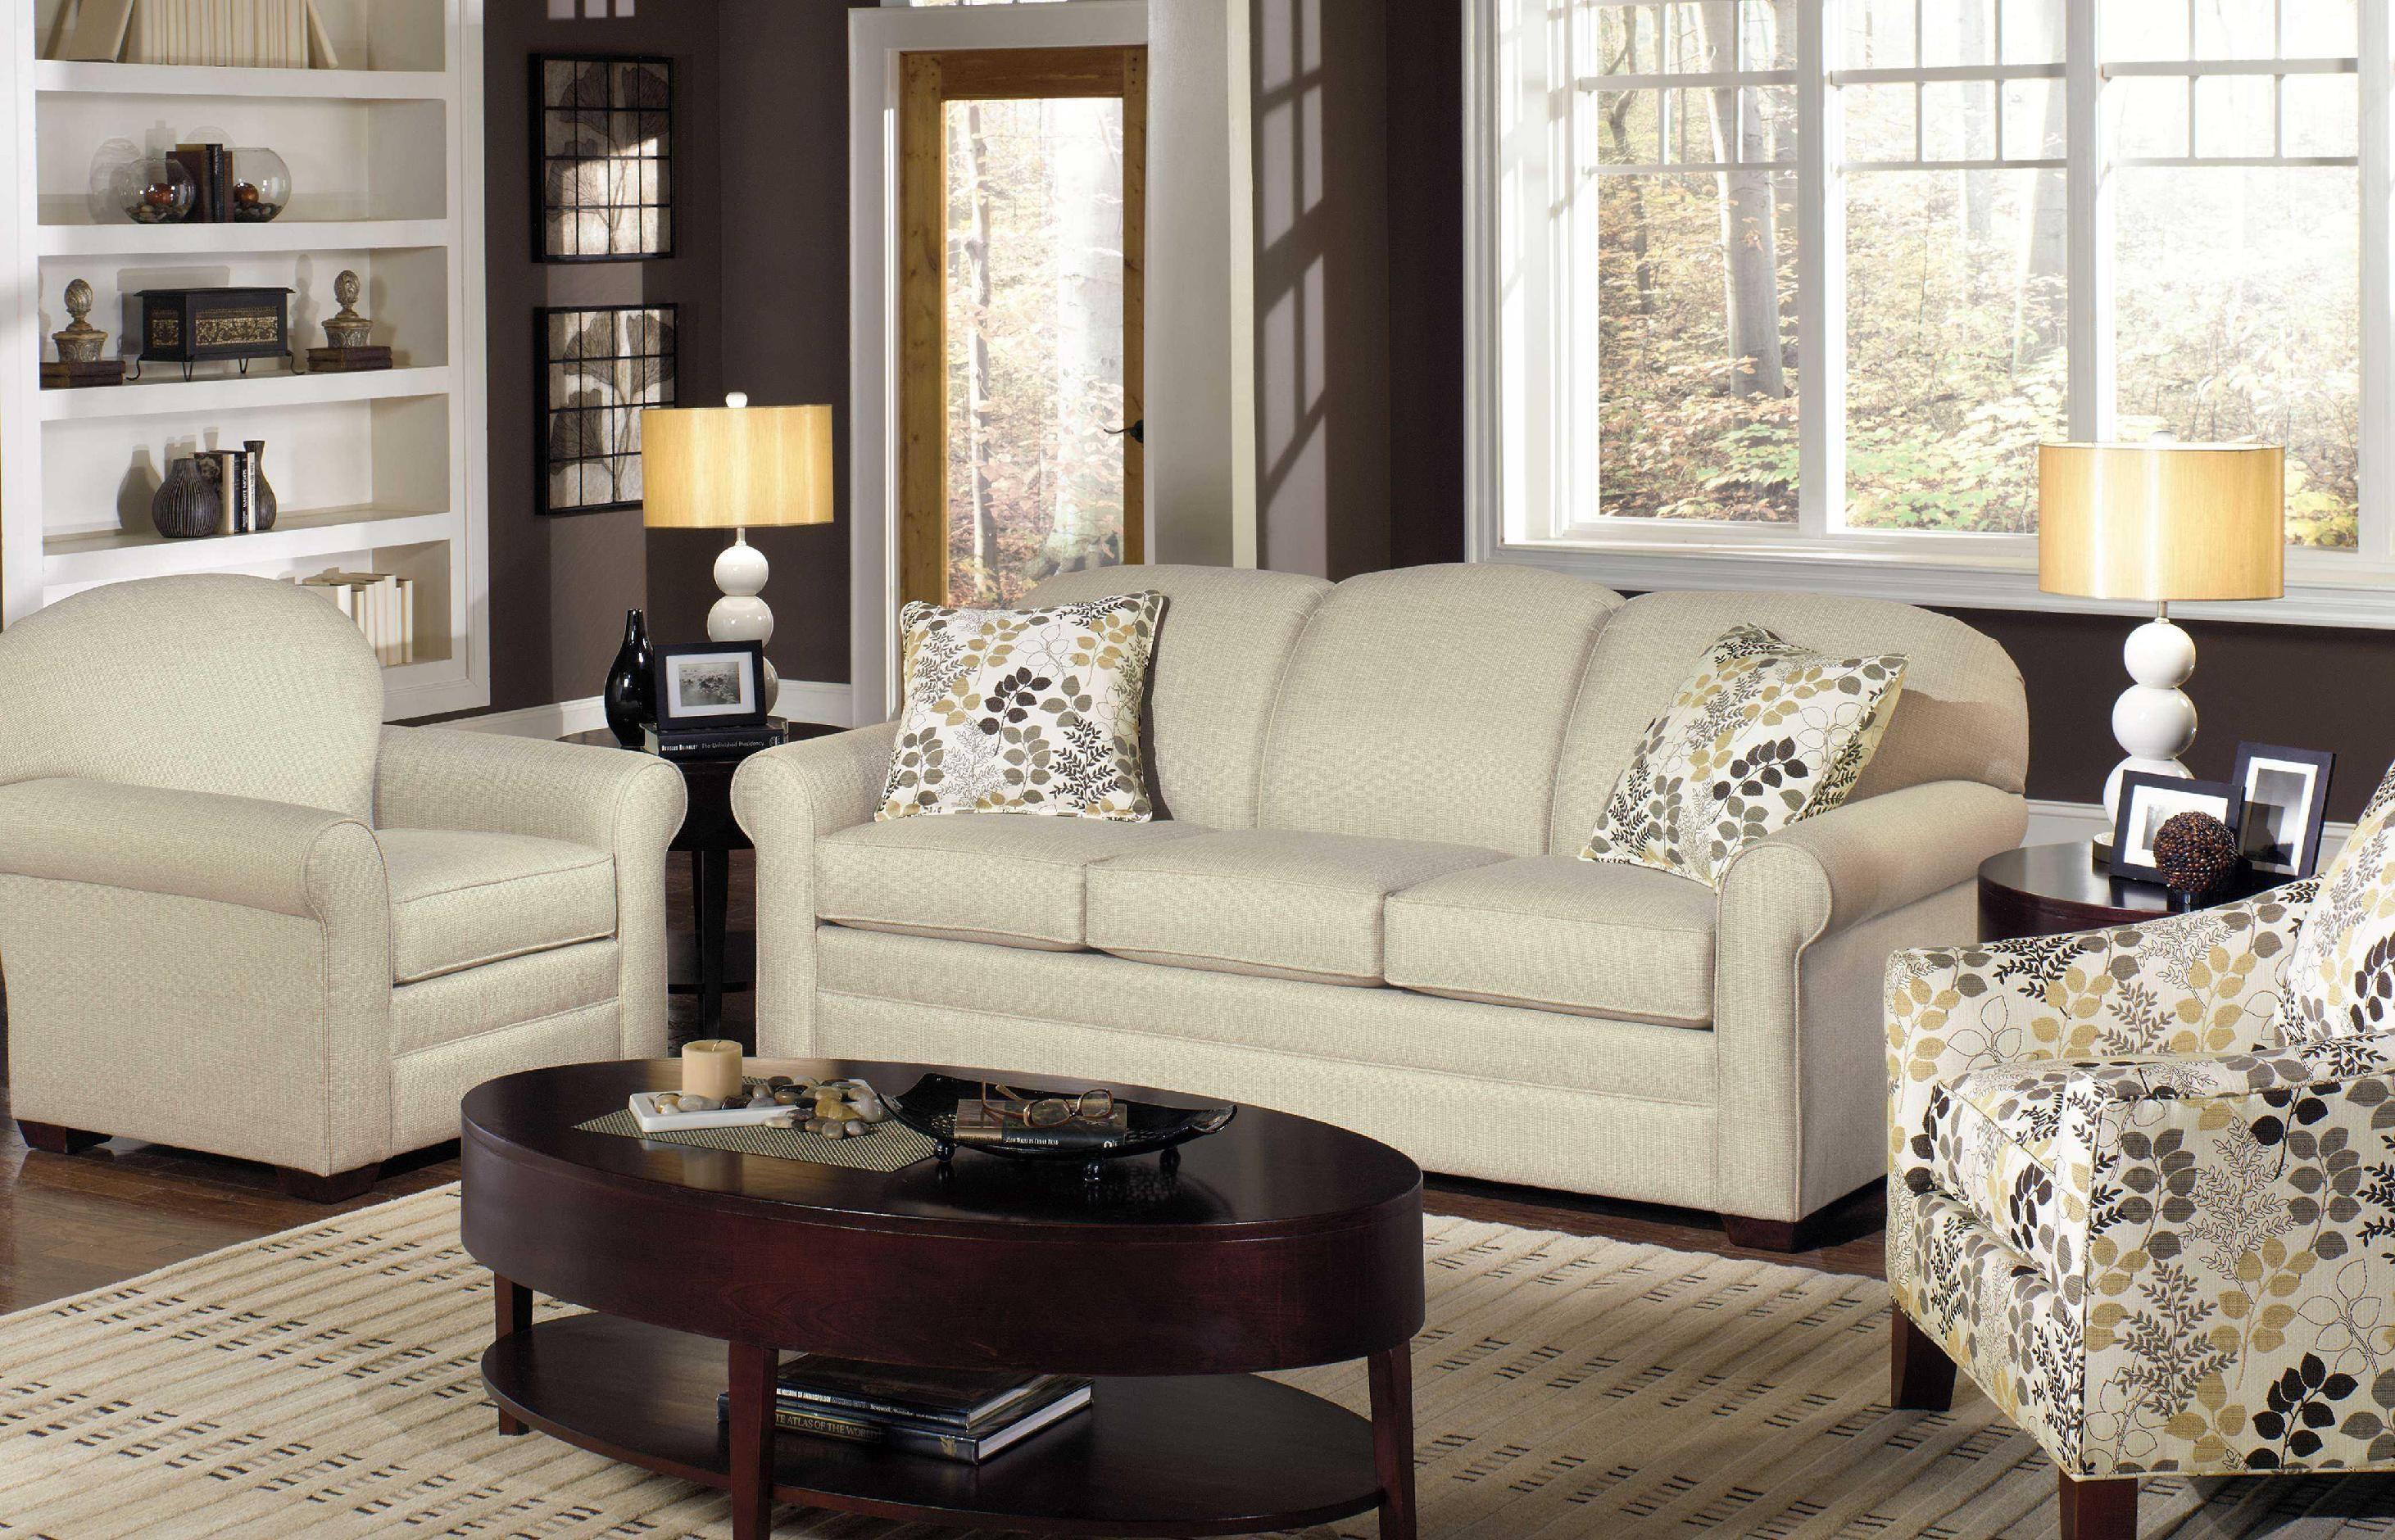 Delightful ... Cozy Life Three Cushion Sofa 718550